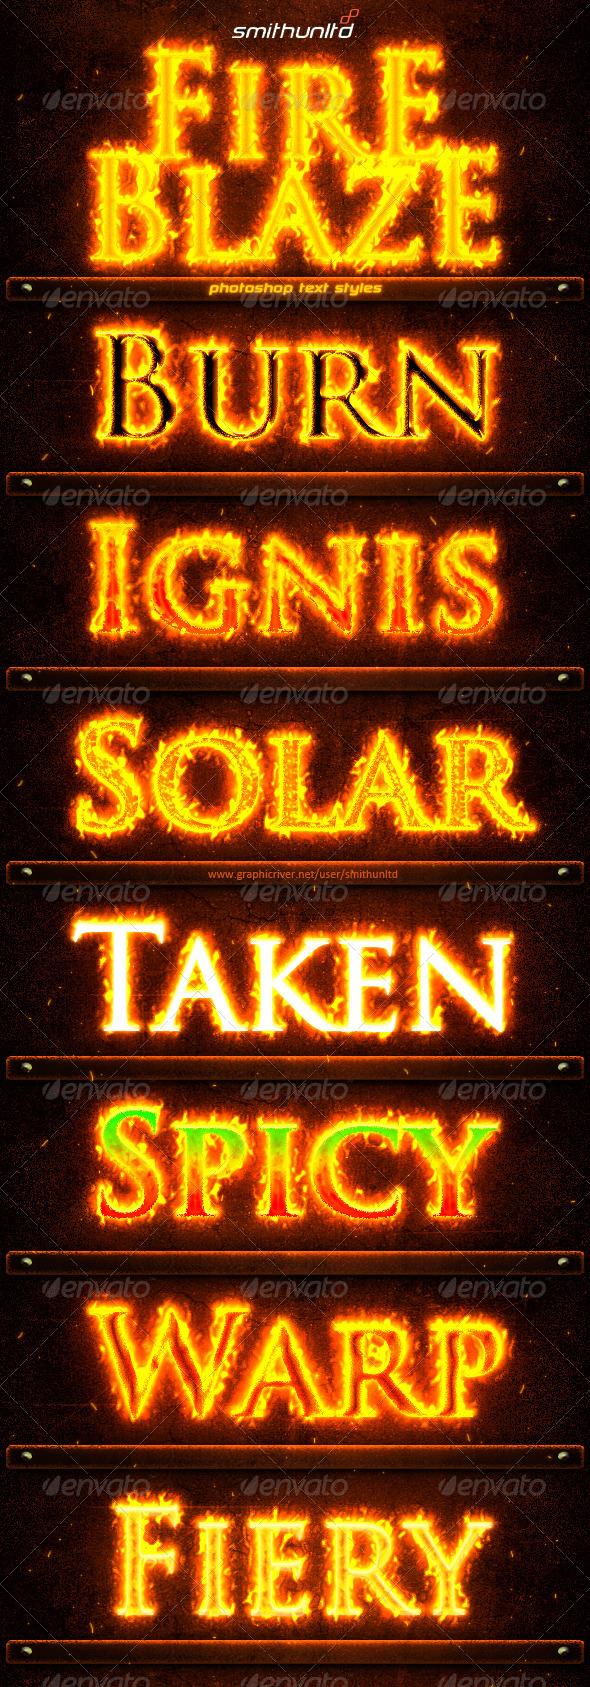 Fire Blaze Text Styles - Text Effects Styles